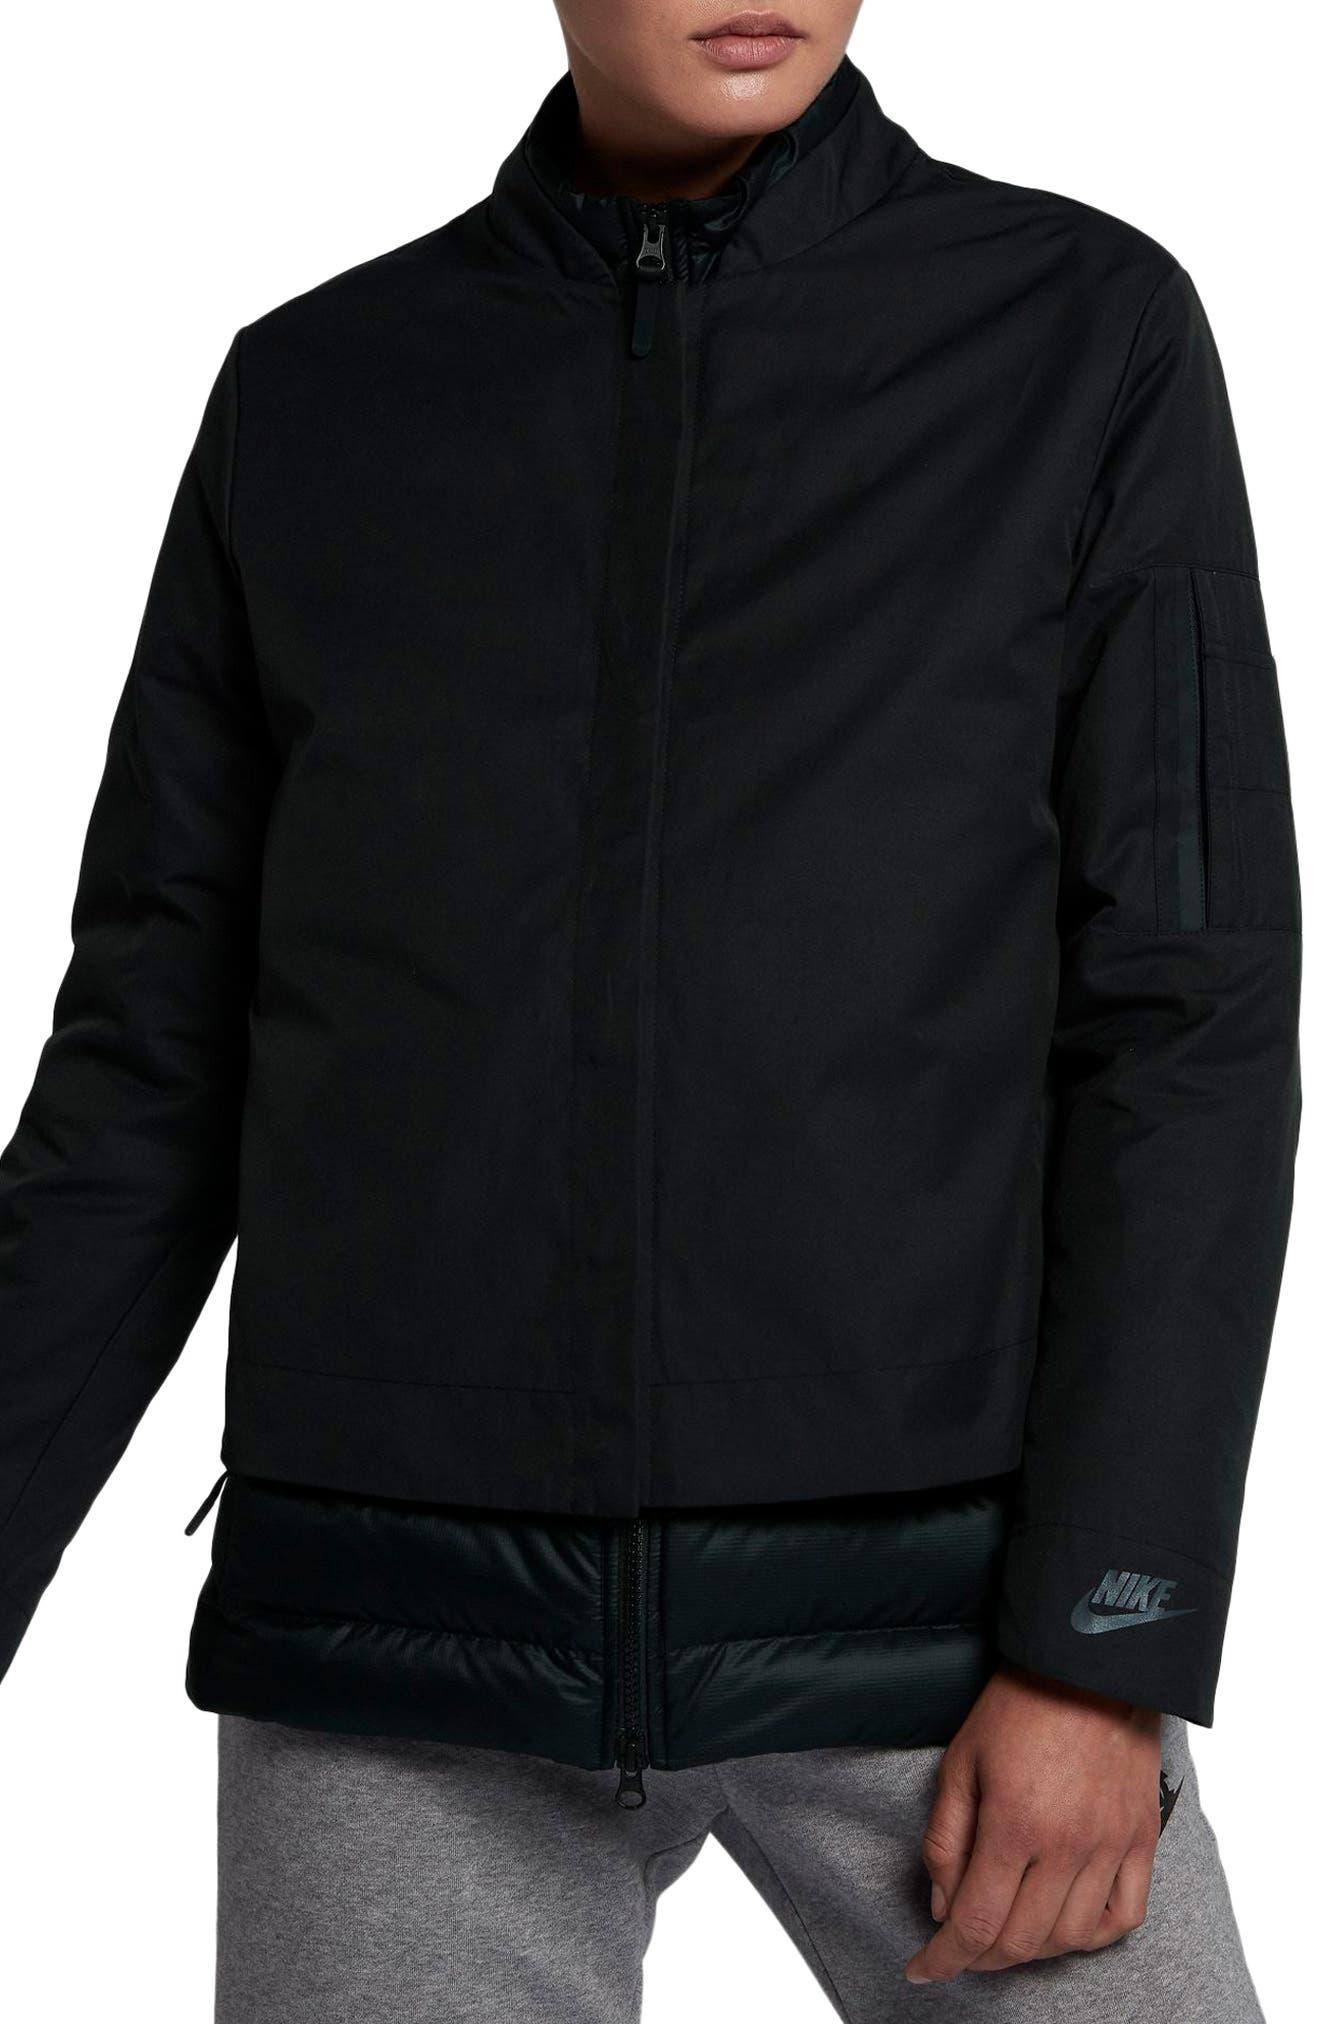 Sportswear AeroLoft 3-in-1 Down Jacket,                             Main thumbnail 1, color,                             Black/ Black/ Black